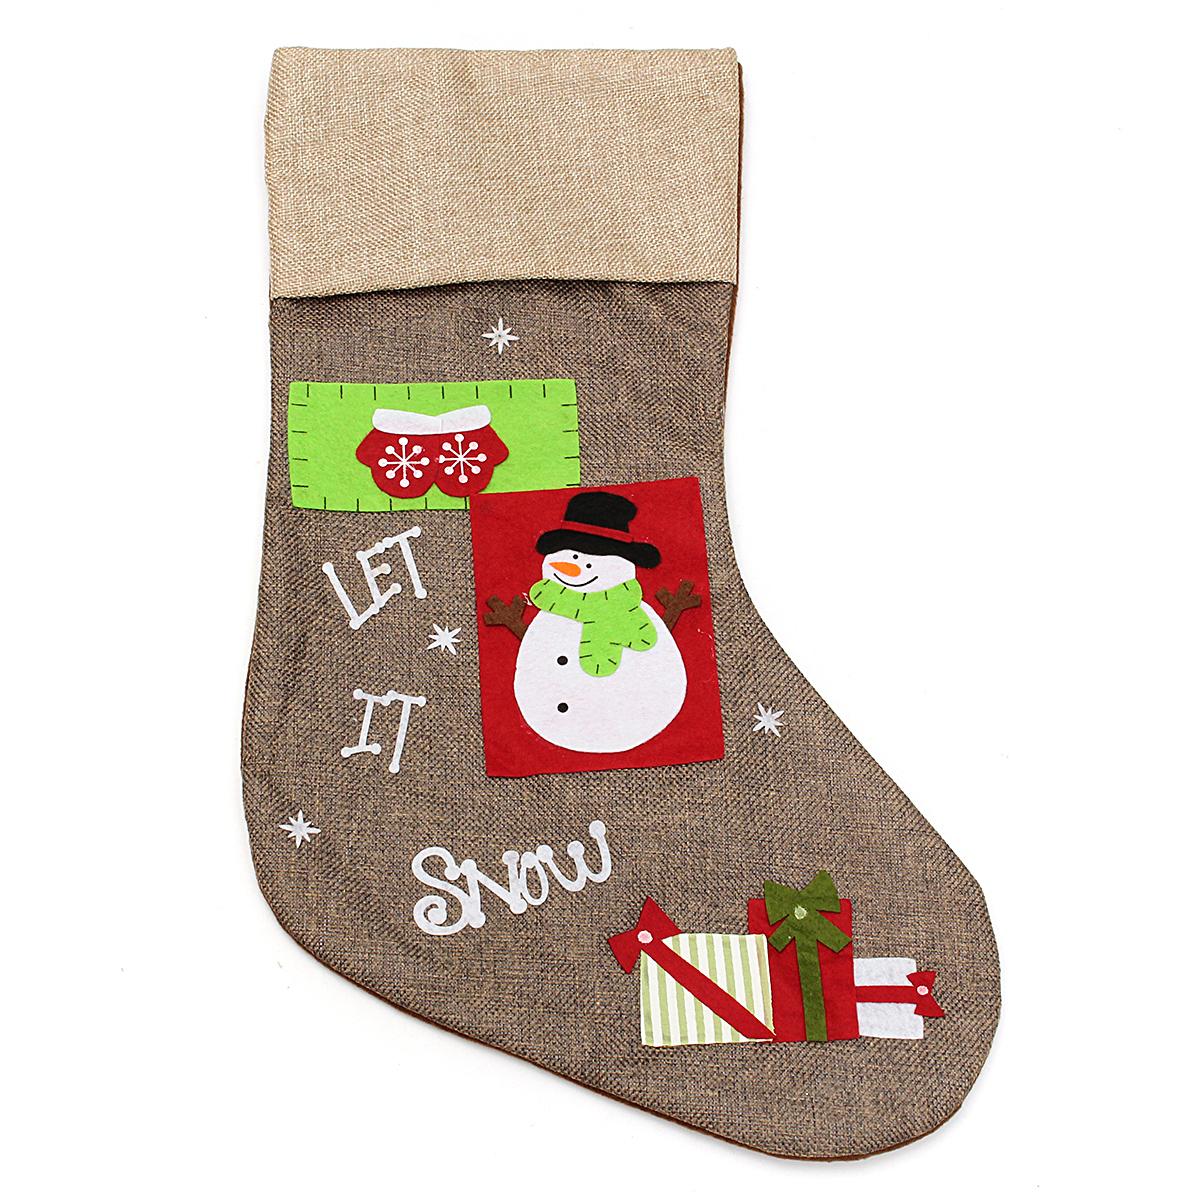 Christmas Gift Socks Bags Santa Claus Snowman Pattern Linen Hanging Stockings